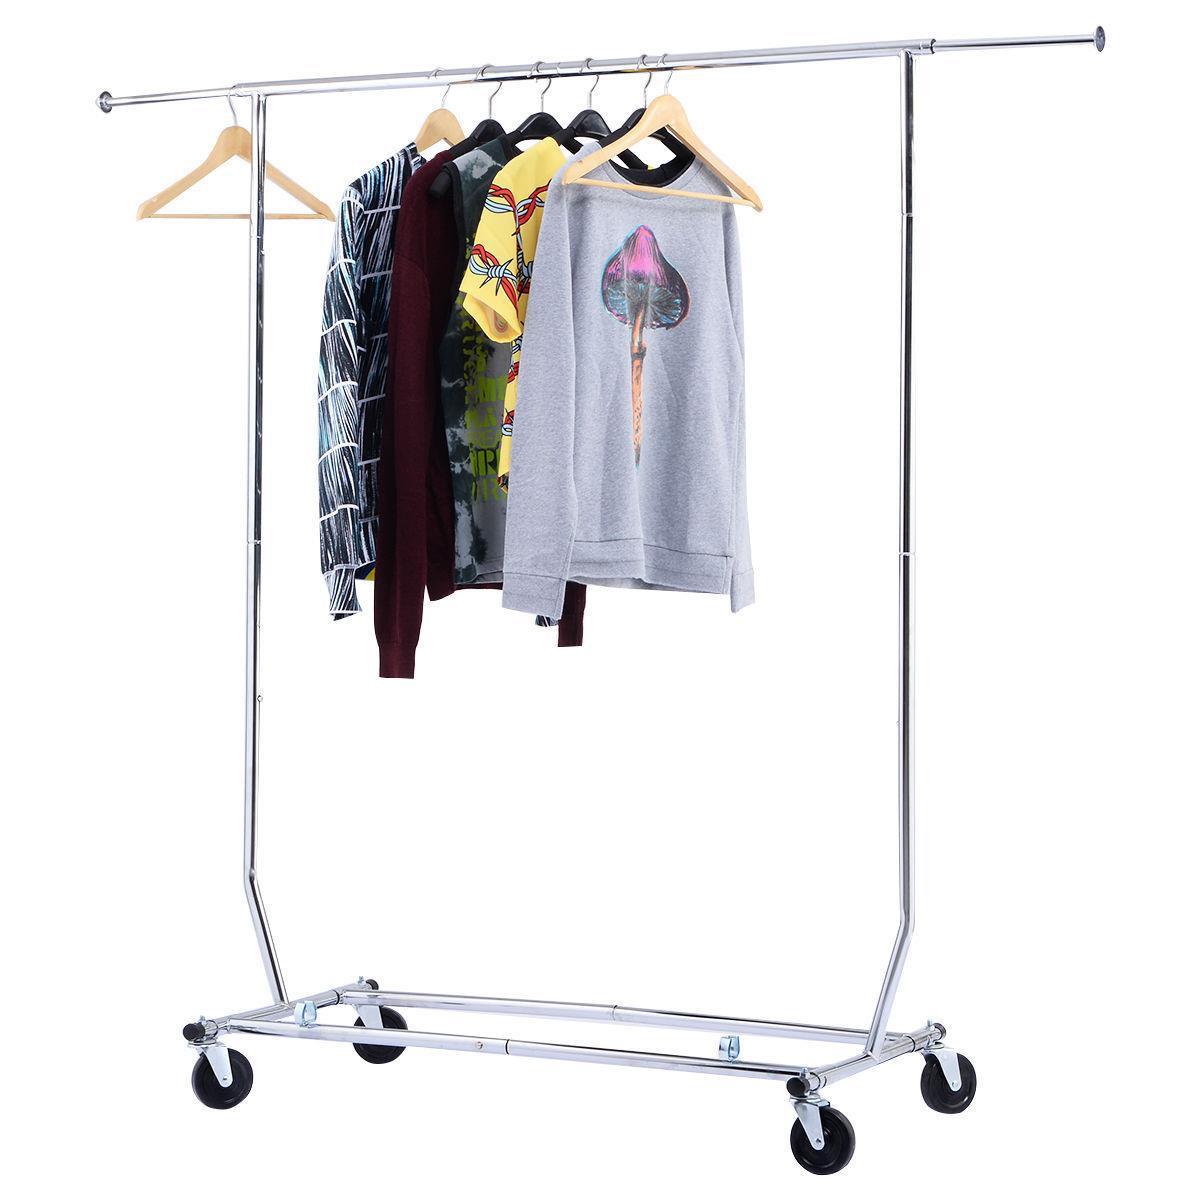 Ktaxon Adjustable Rail Garment Rack Heavy Duty Rolling Clothes Hanger Single Bar Hanging